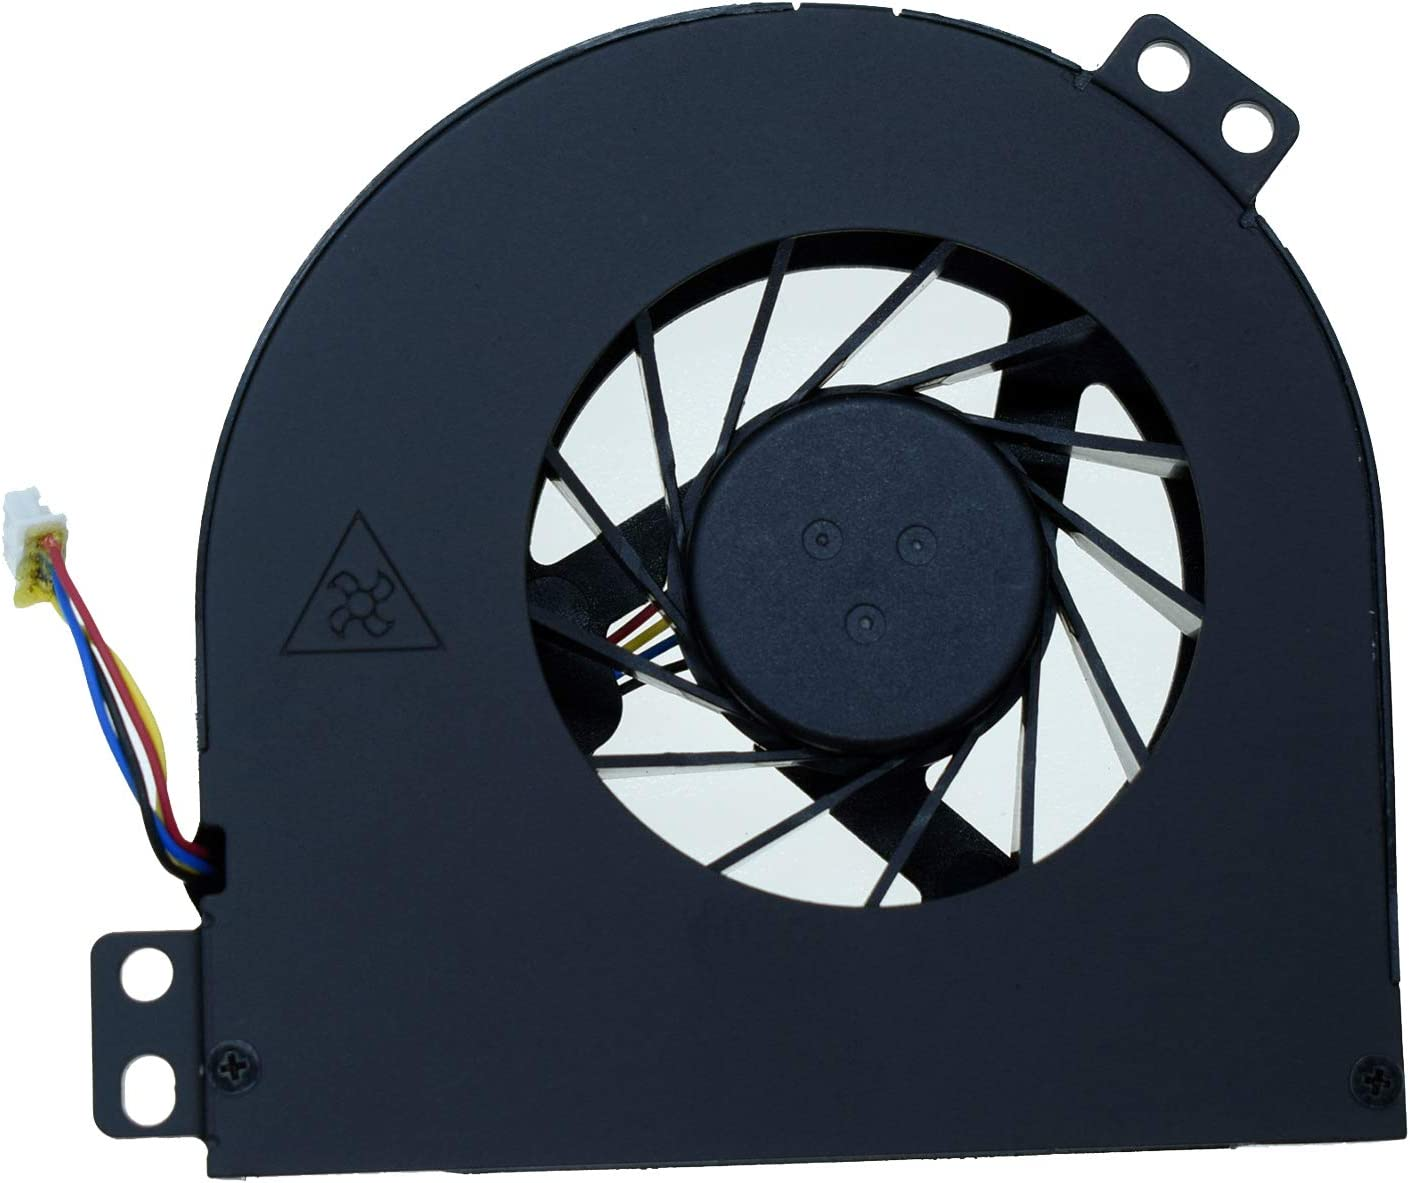 DREZUR GPU Cooling Fan Parts Compatible for Del Precision M4700 M4800 Series Laptop Cooler P21F DC28000B2SL MG60150V1-C030-S9A 01G40N 1G40N